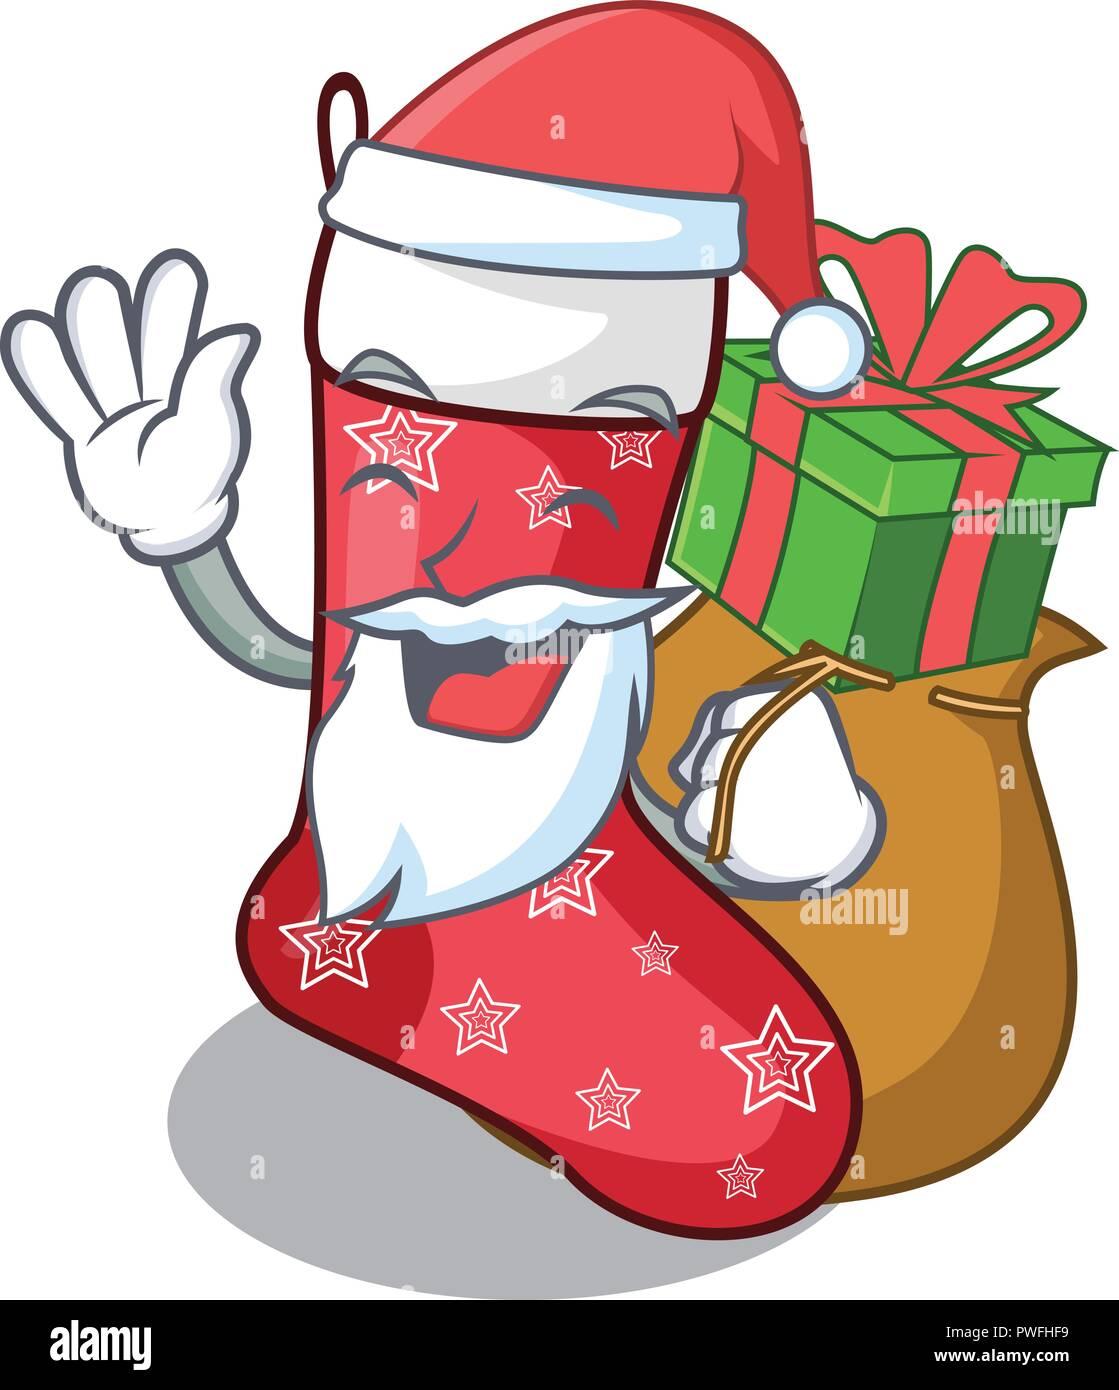 Christmas Stockings Cartoon.Santa With Gift Cute Christmas Socks Isolated On Mascot